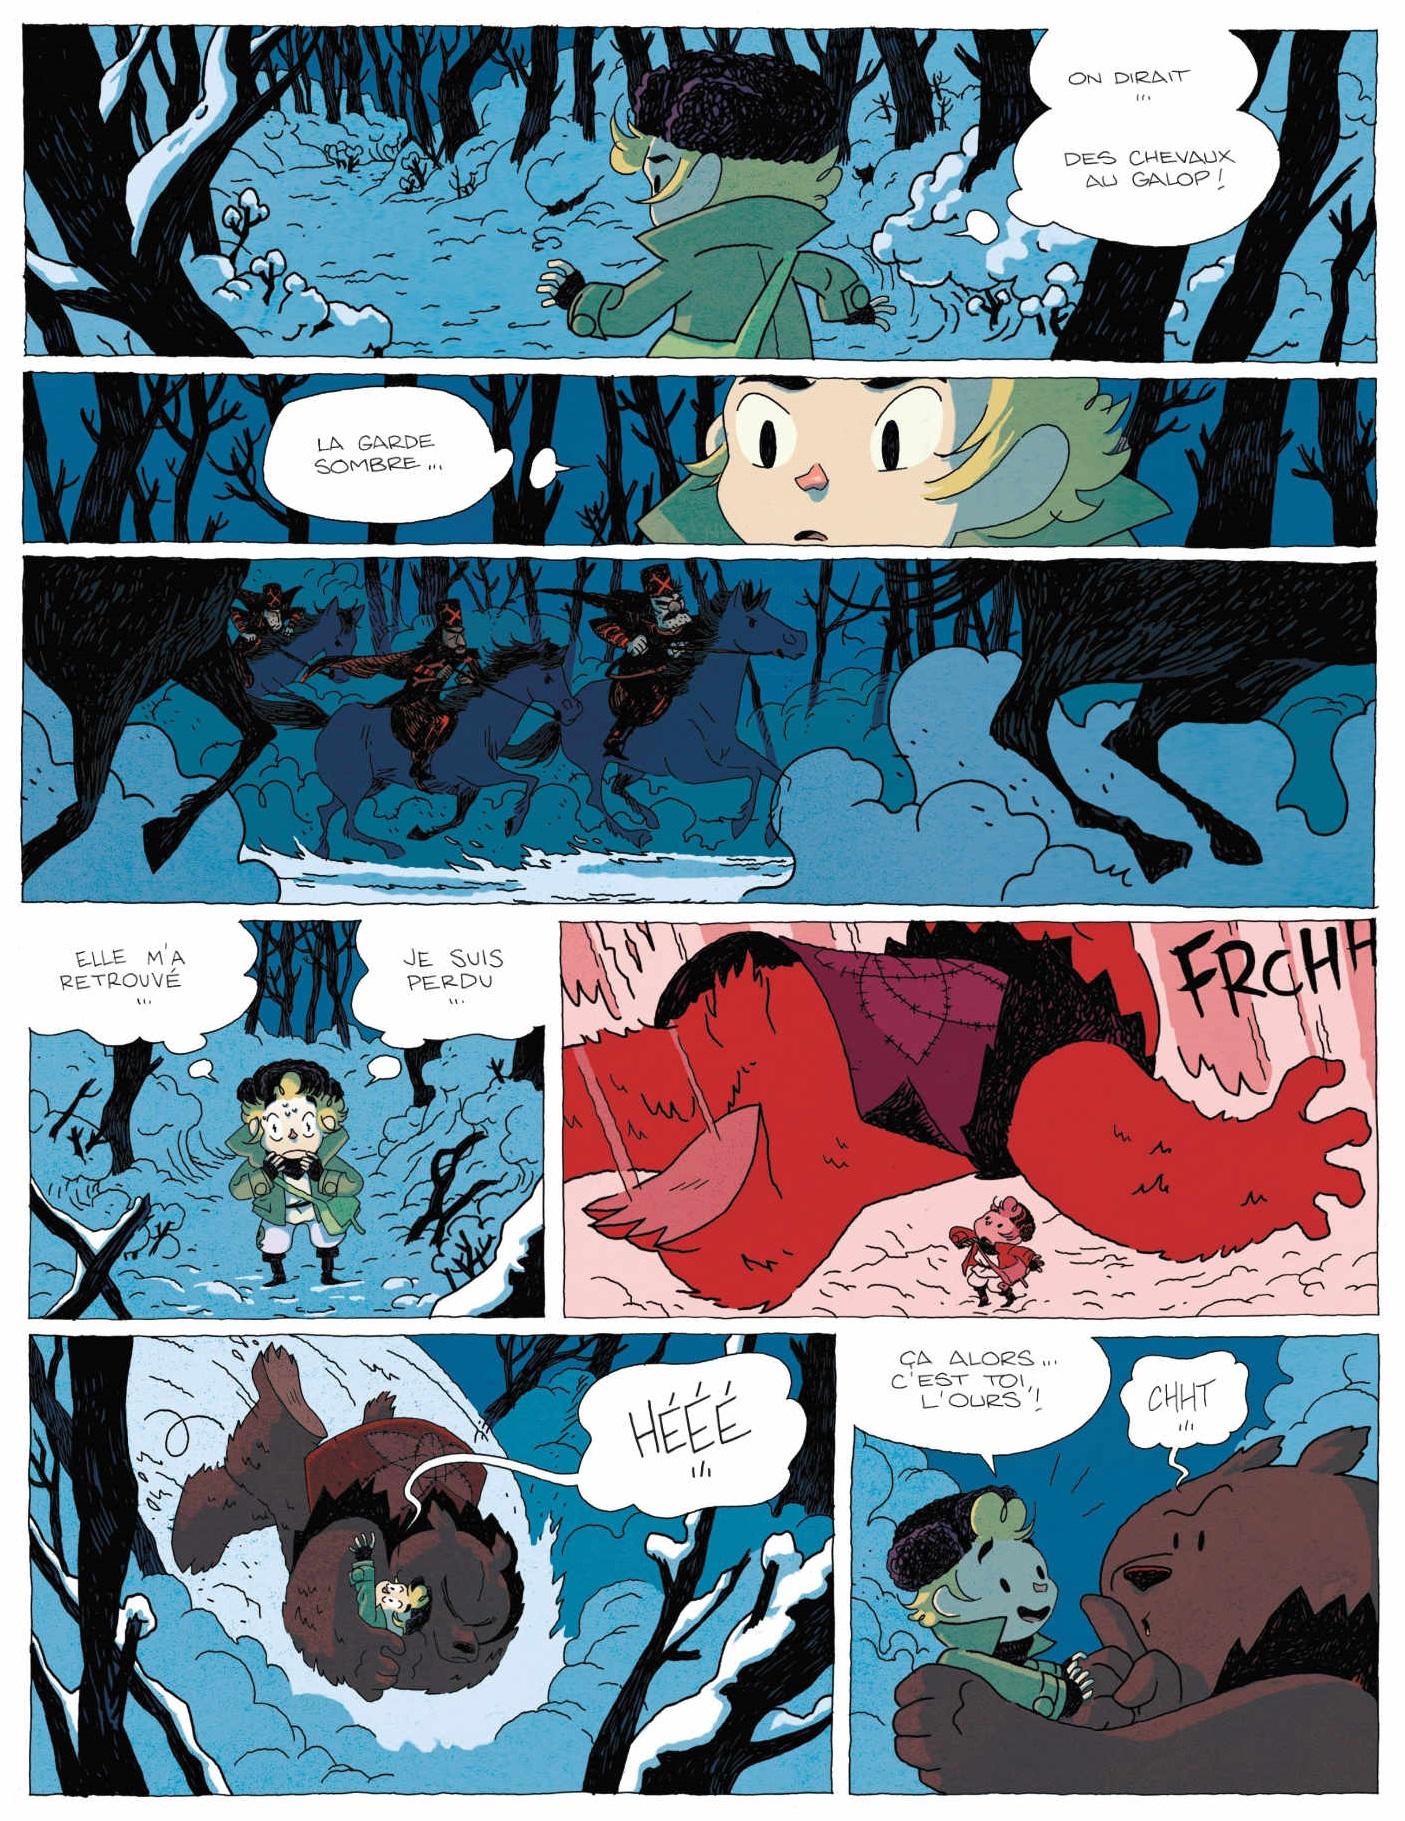 Balthazar au pays Blême page 53